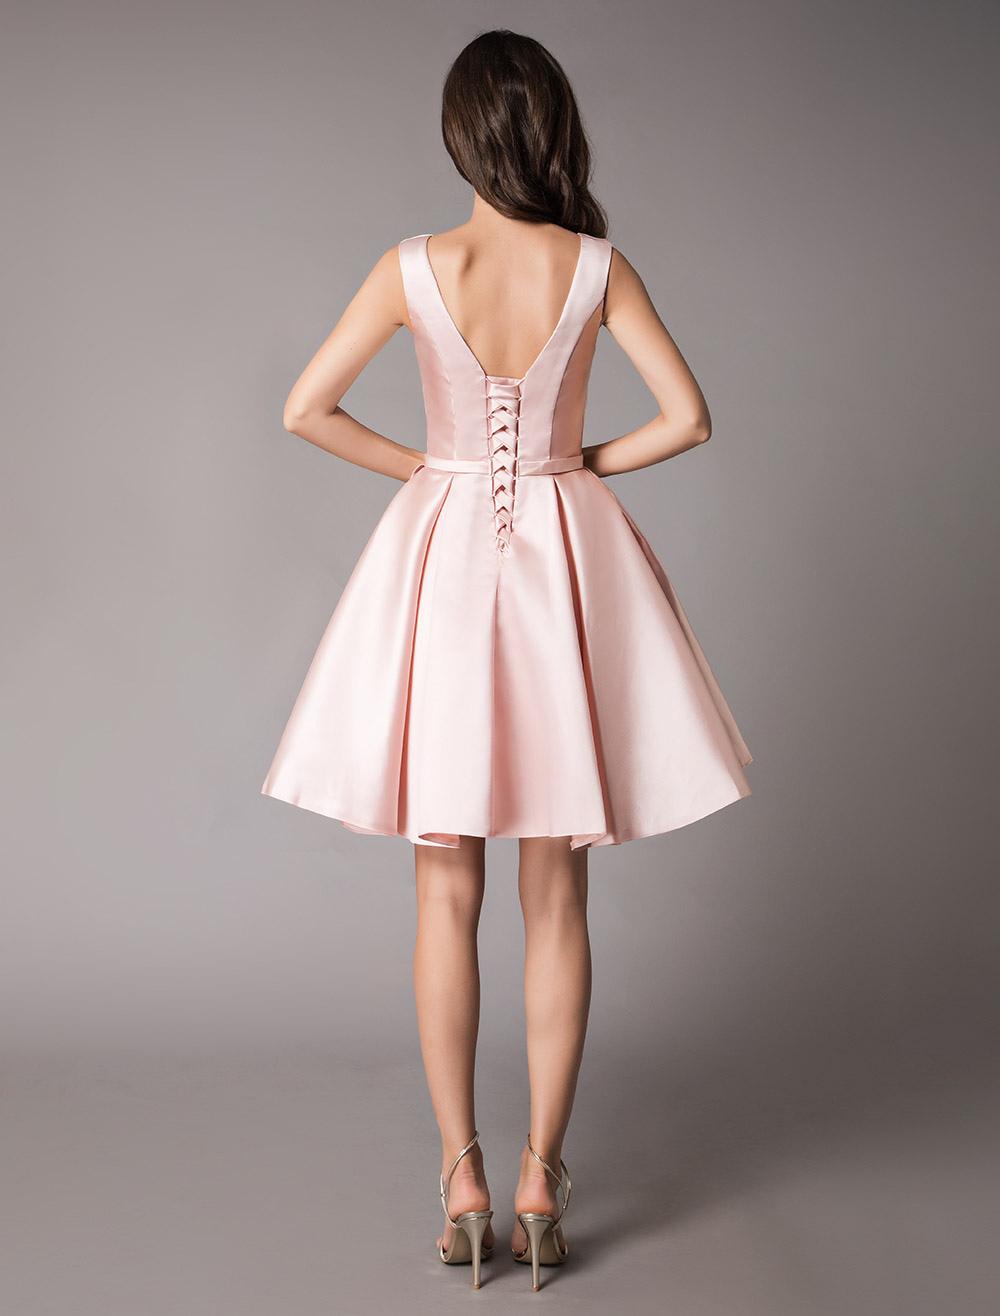 19205b315e8ff5 ... Satin Cocktail Dresses Soft Pink A Line Sleeveless Short Prom Dress-No.8.  12